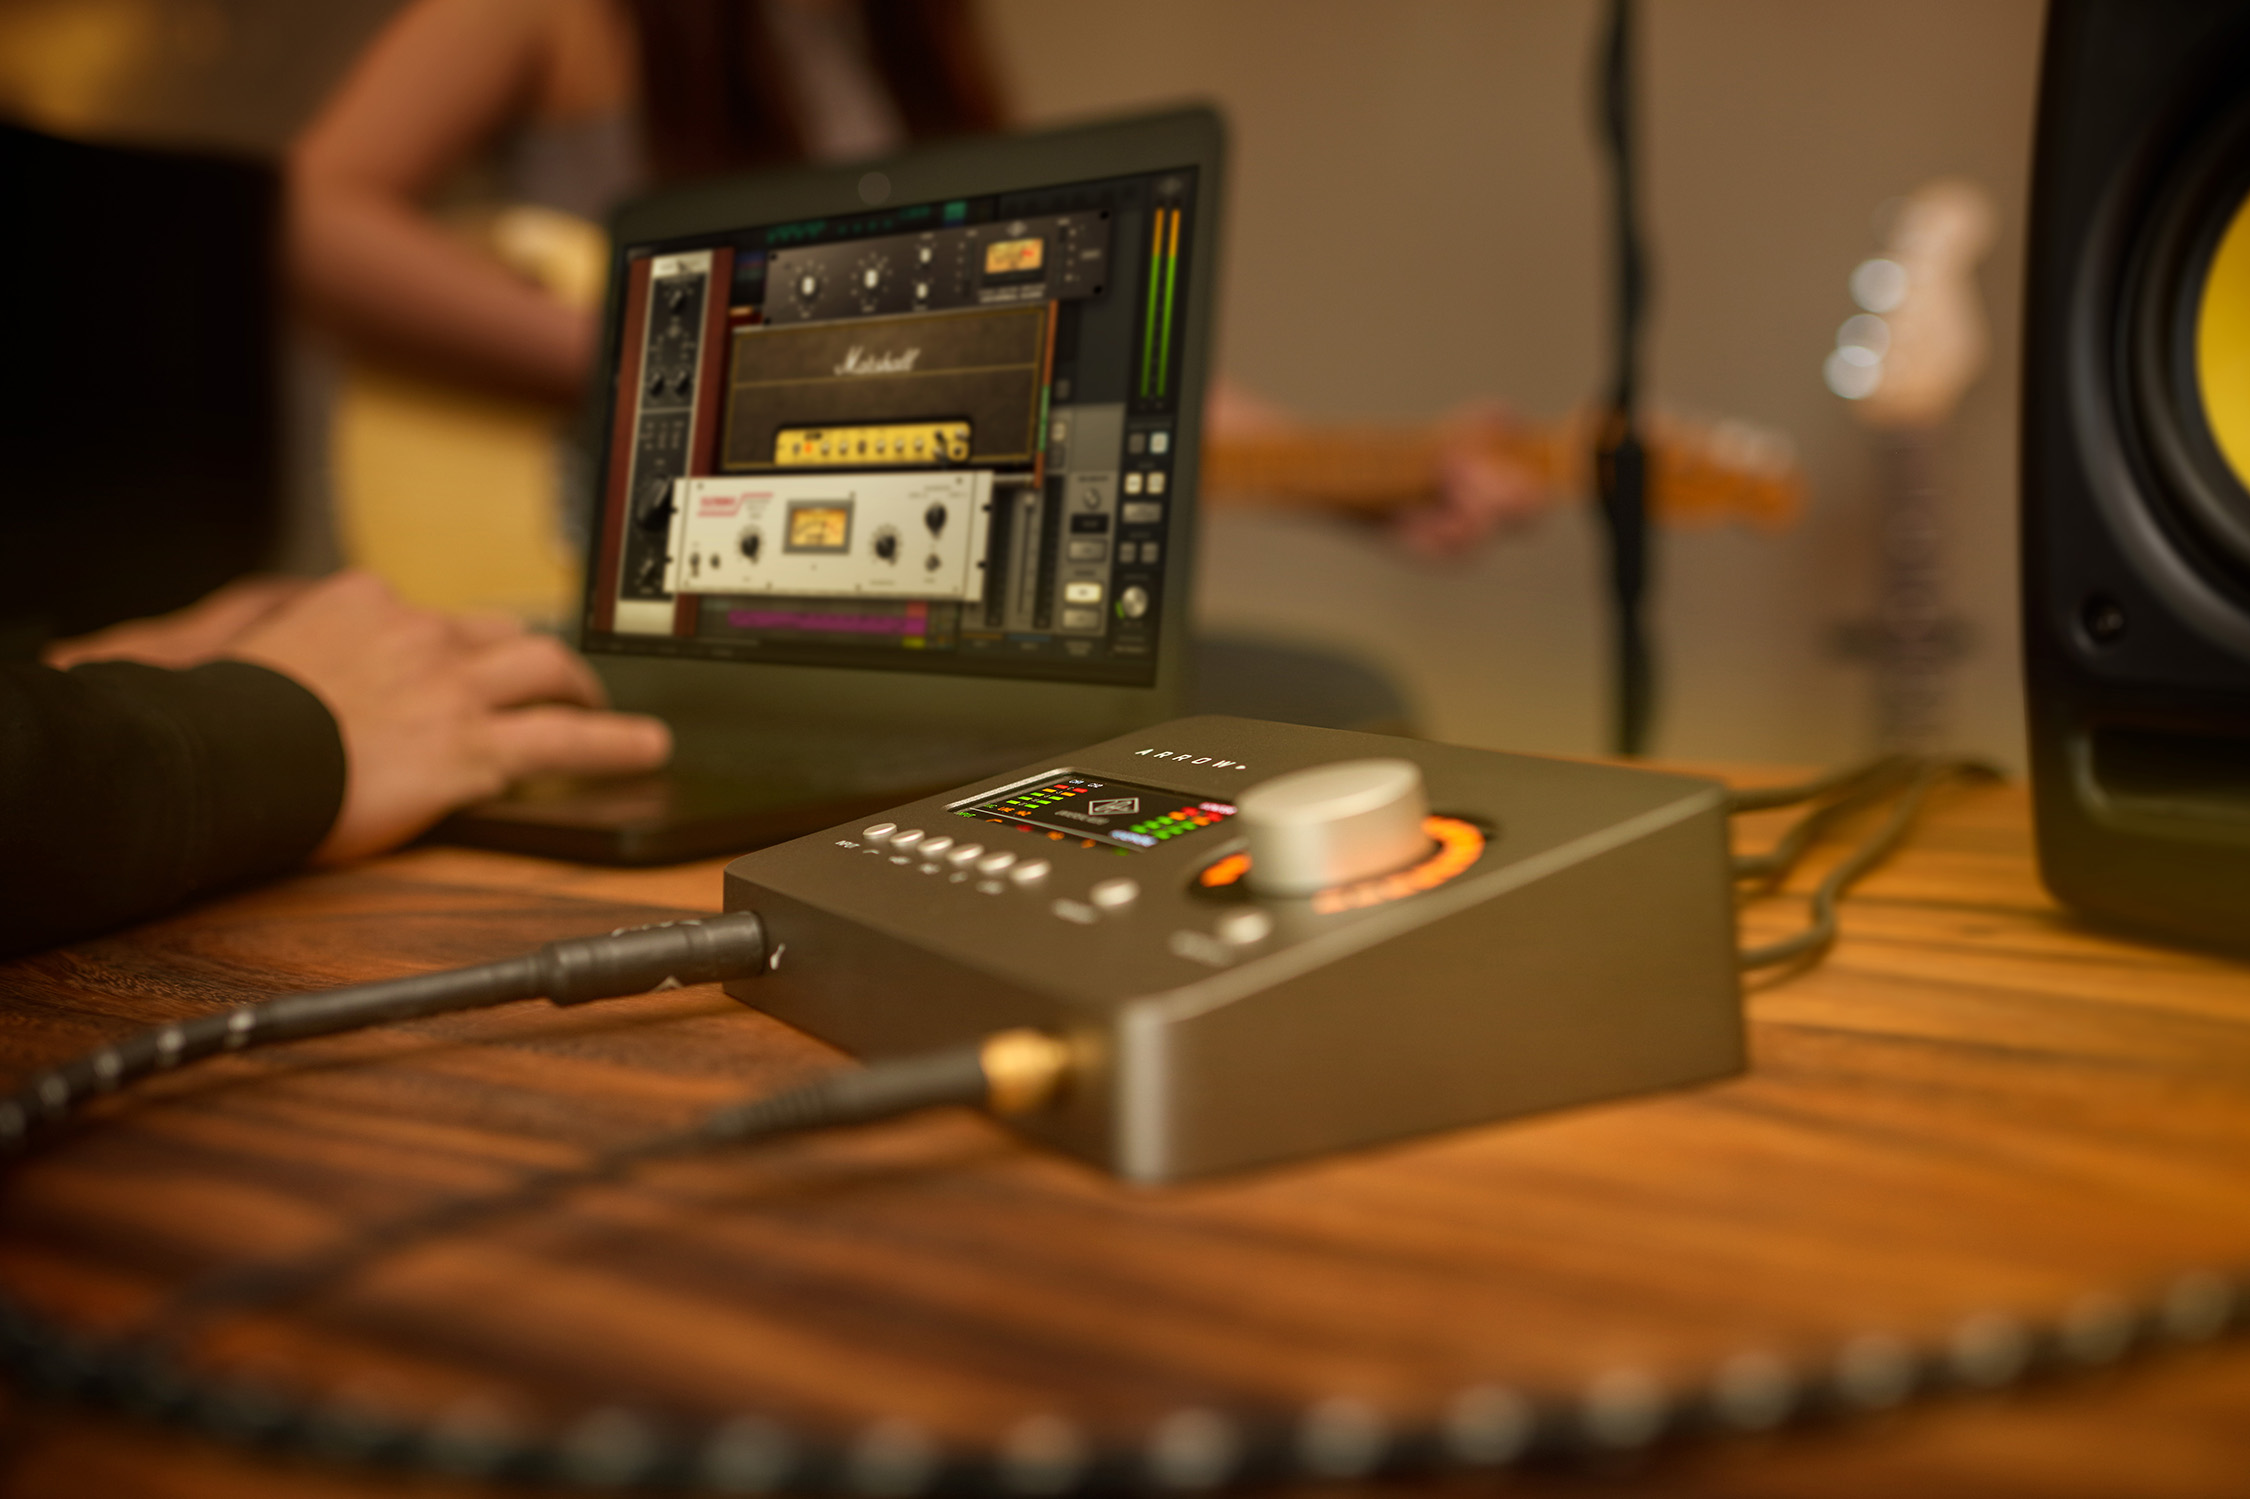 Universal Audio Arrow – UA lanserar professionellt ljudkort under 5000:-